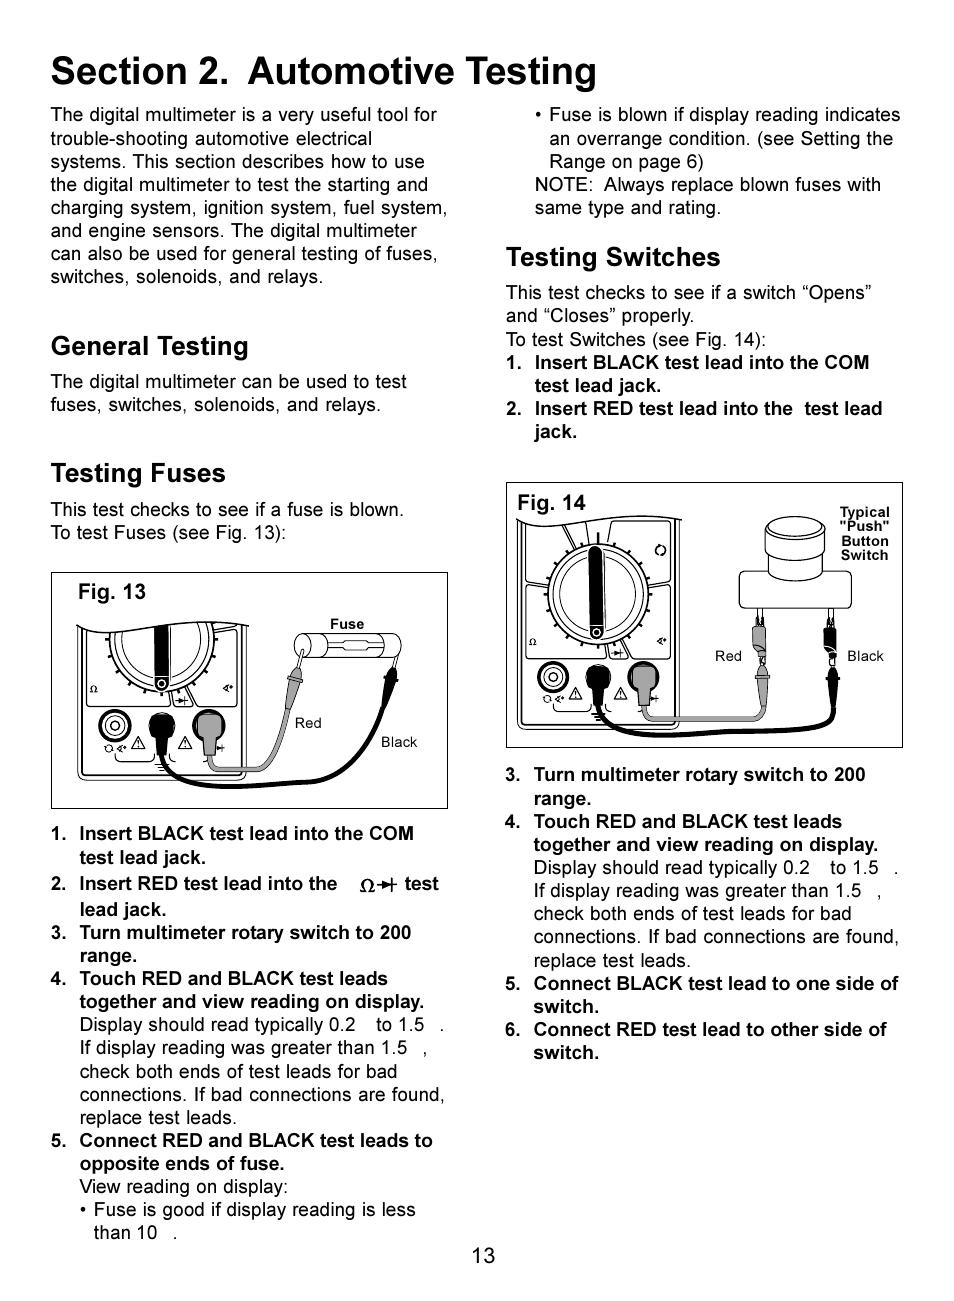 general testing testing fuses testing switches actron digital rh manualsdir com Amprobe Multimeter Actron Voltmeter